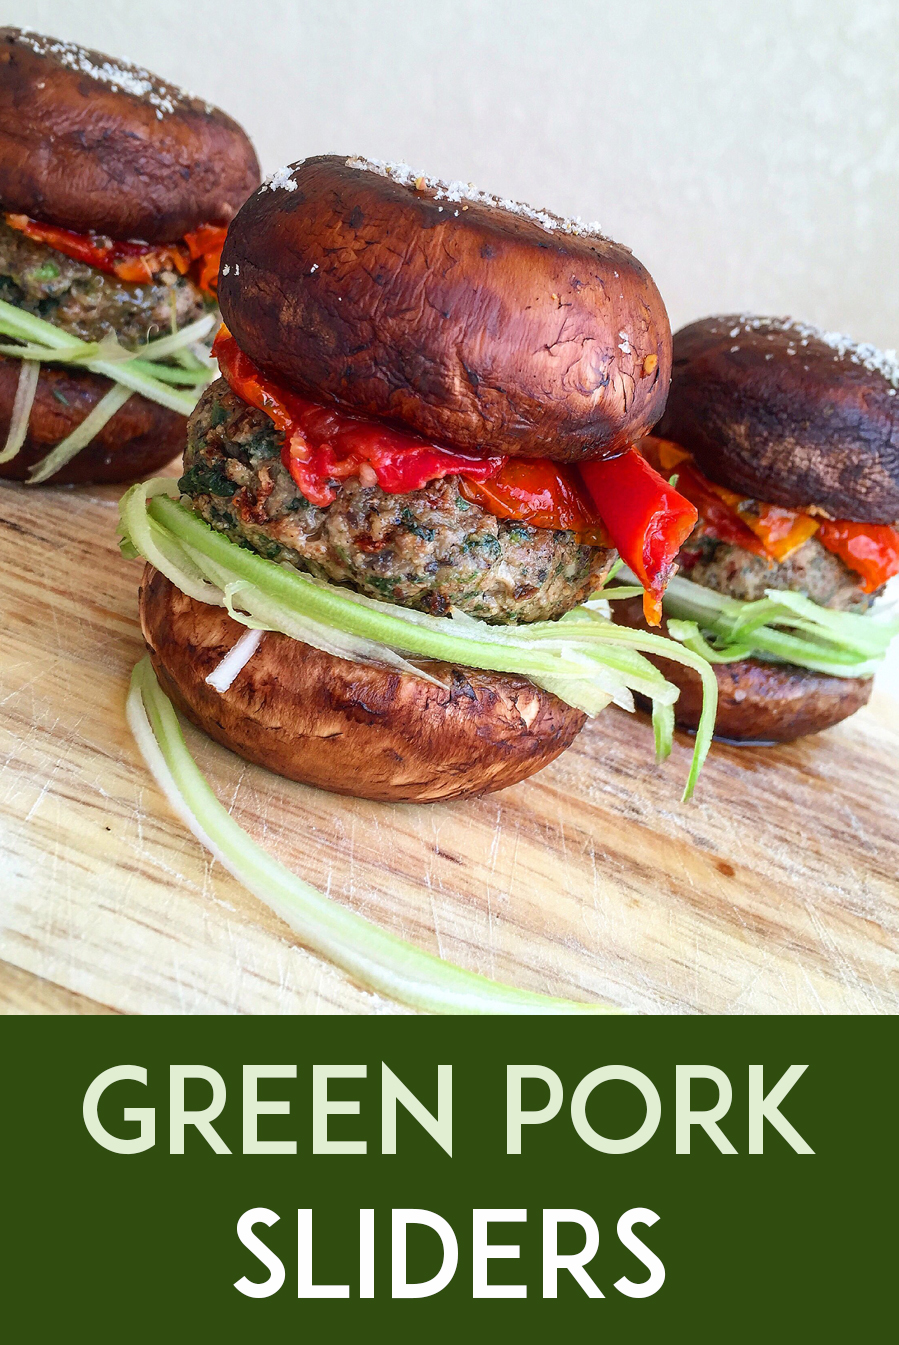 Green Pork Sliders (grain-free, dairy-free, paleo) | GrokGrub.com #grainfree #healthy #paleo #lunch